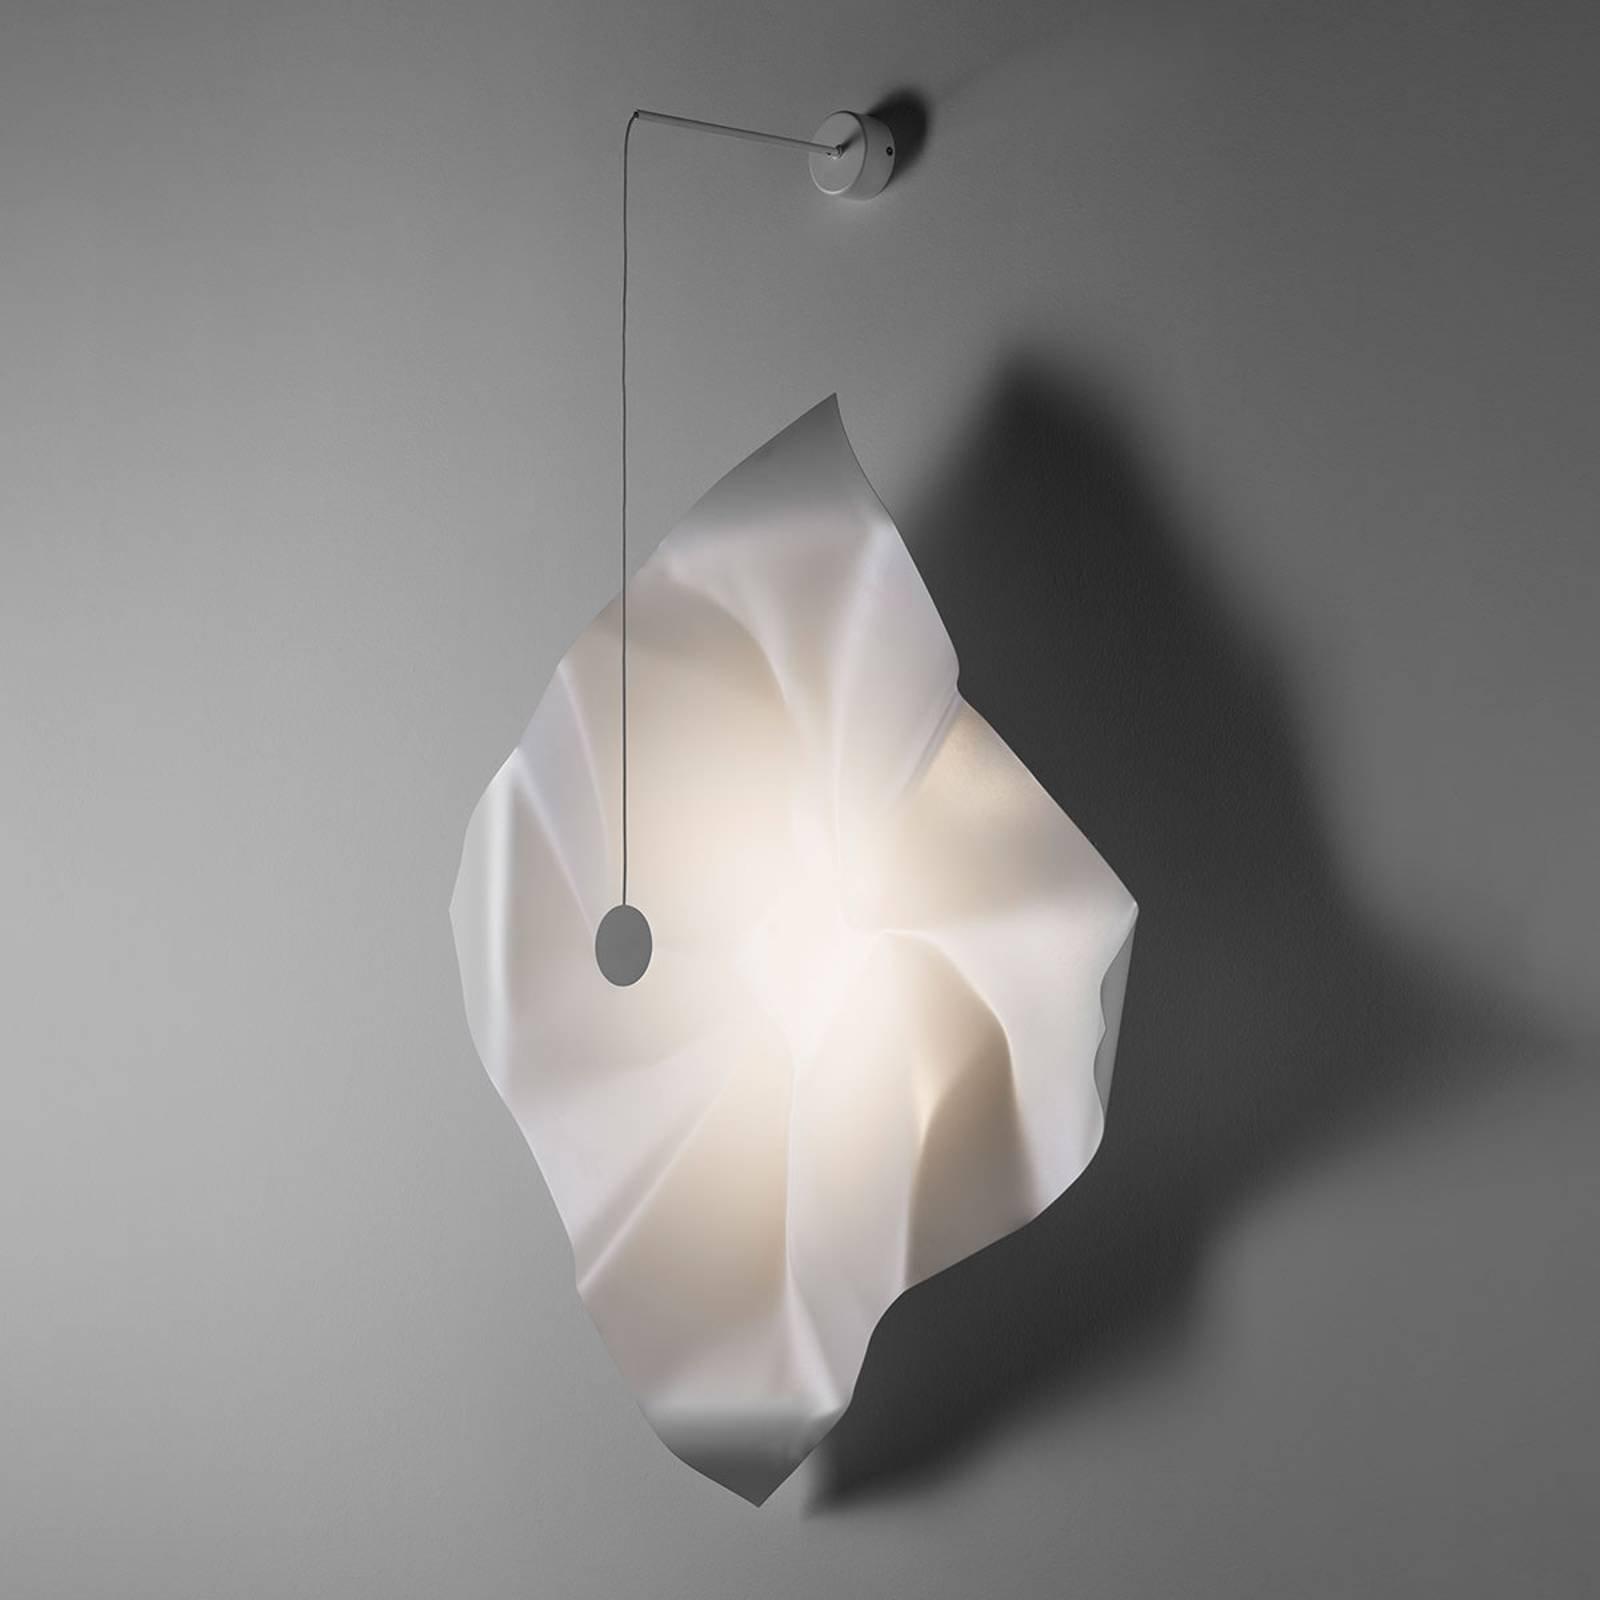 Knikerboker Crash LED-vegglampe hvit kvadratisk